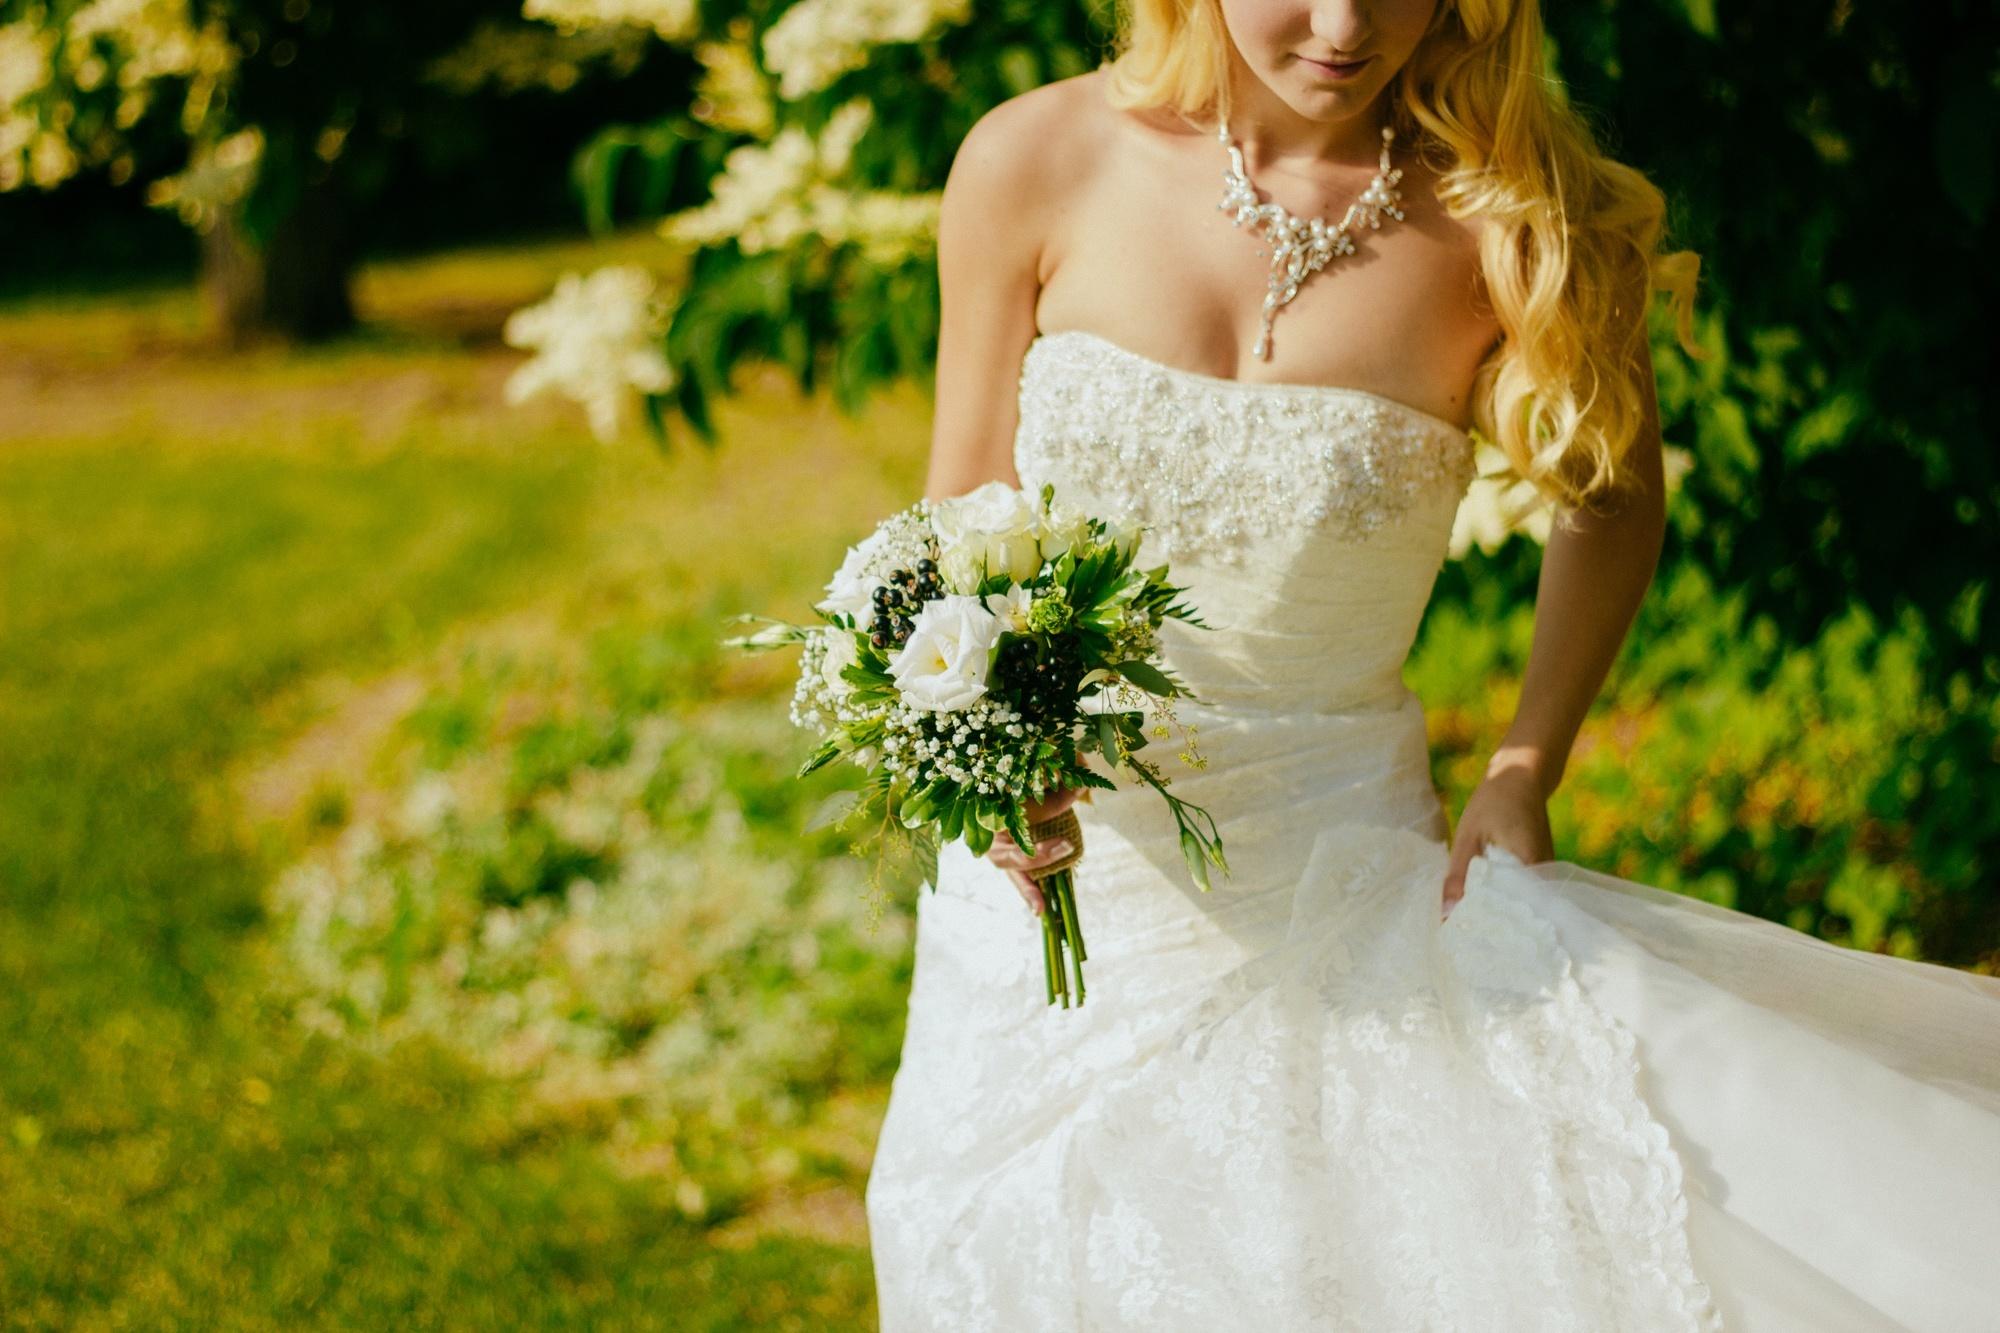 Monica.Justesen.Photography.Creative.Wedding.Photographer.Massachusetts.12.jpg